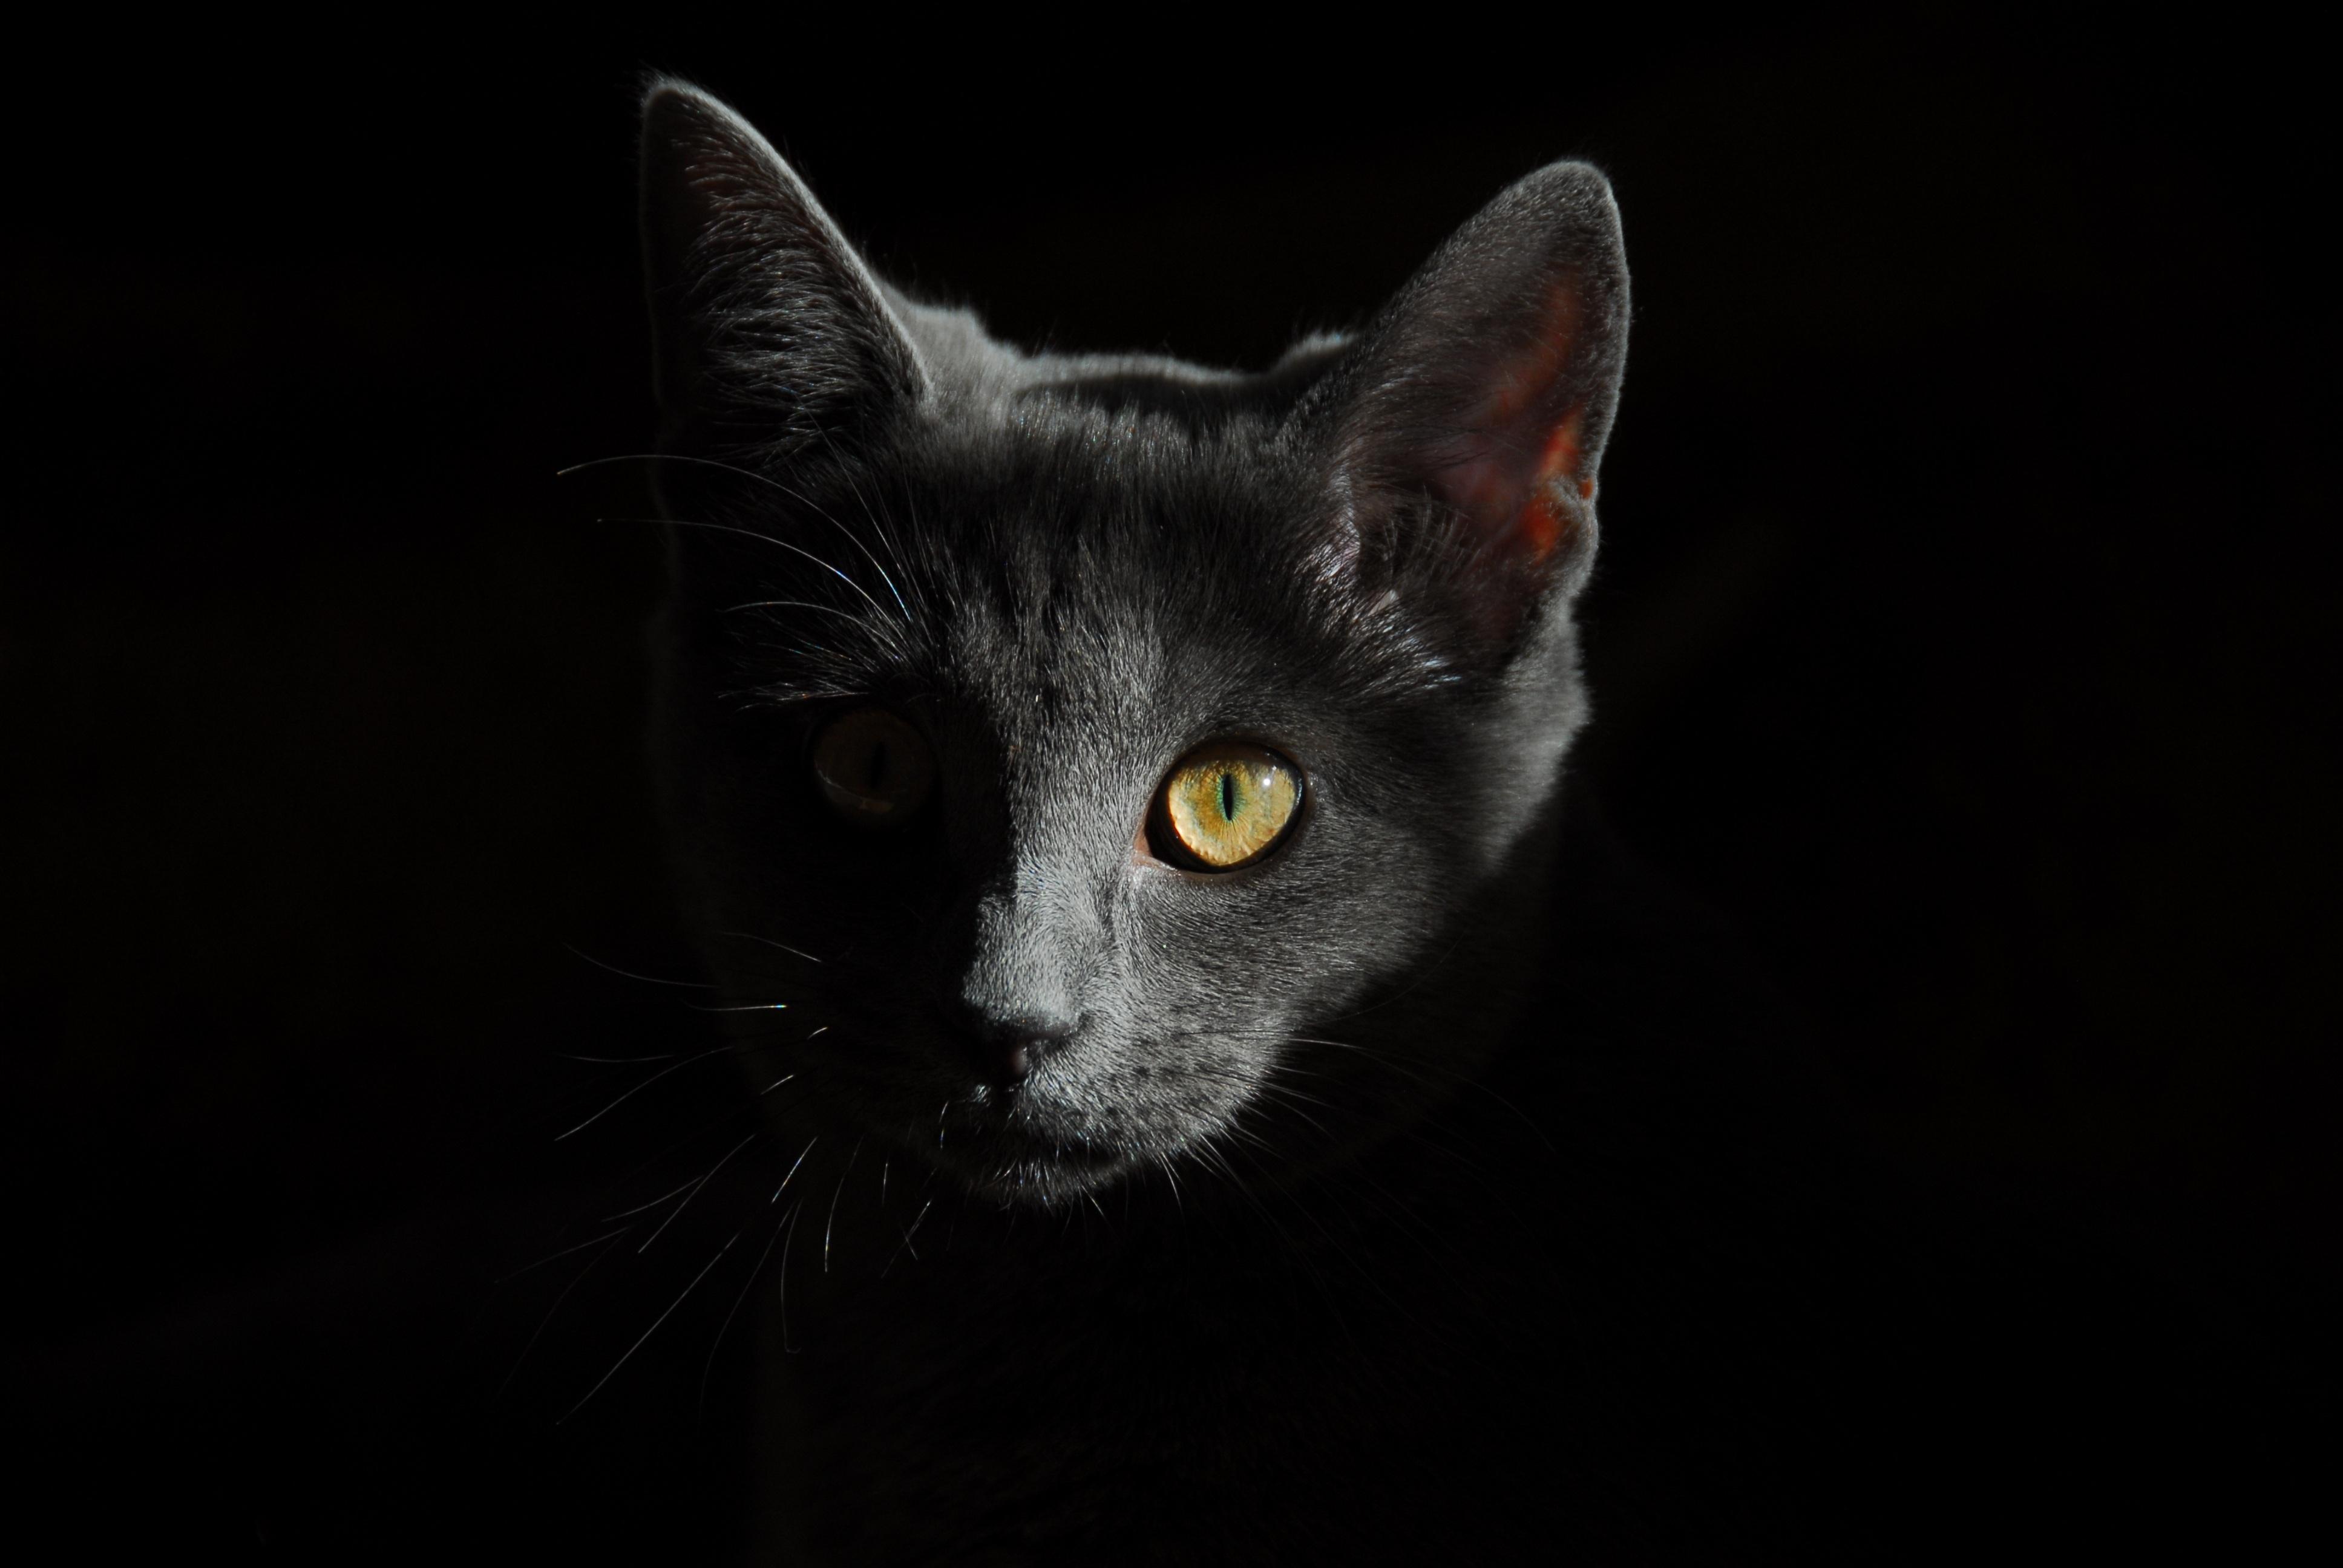 Gratis svart pussys